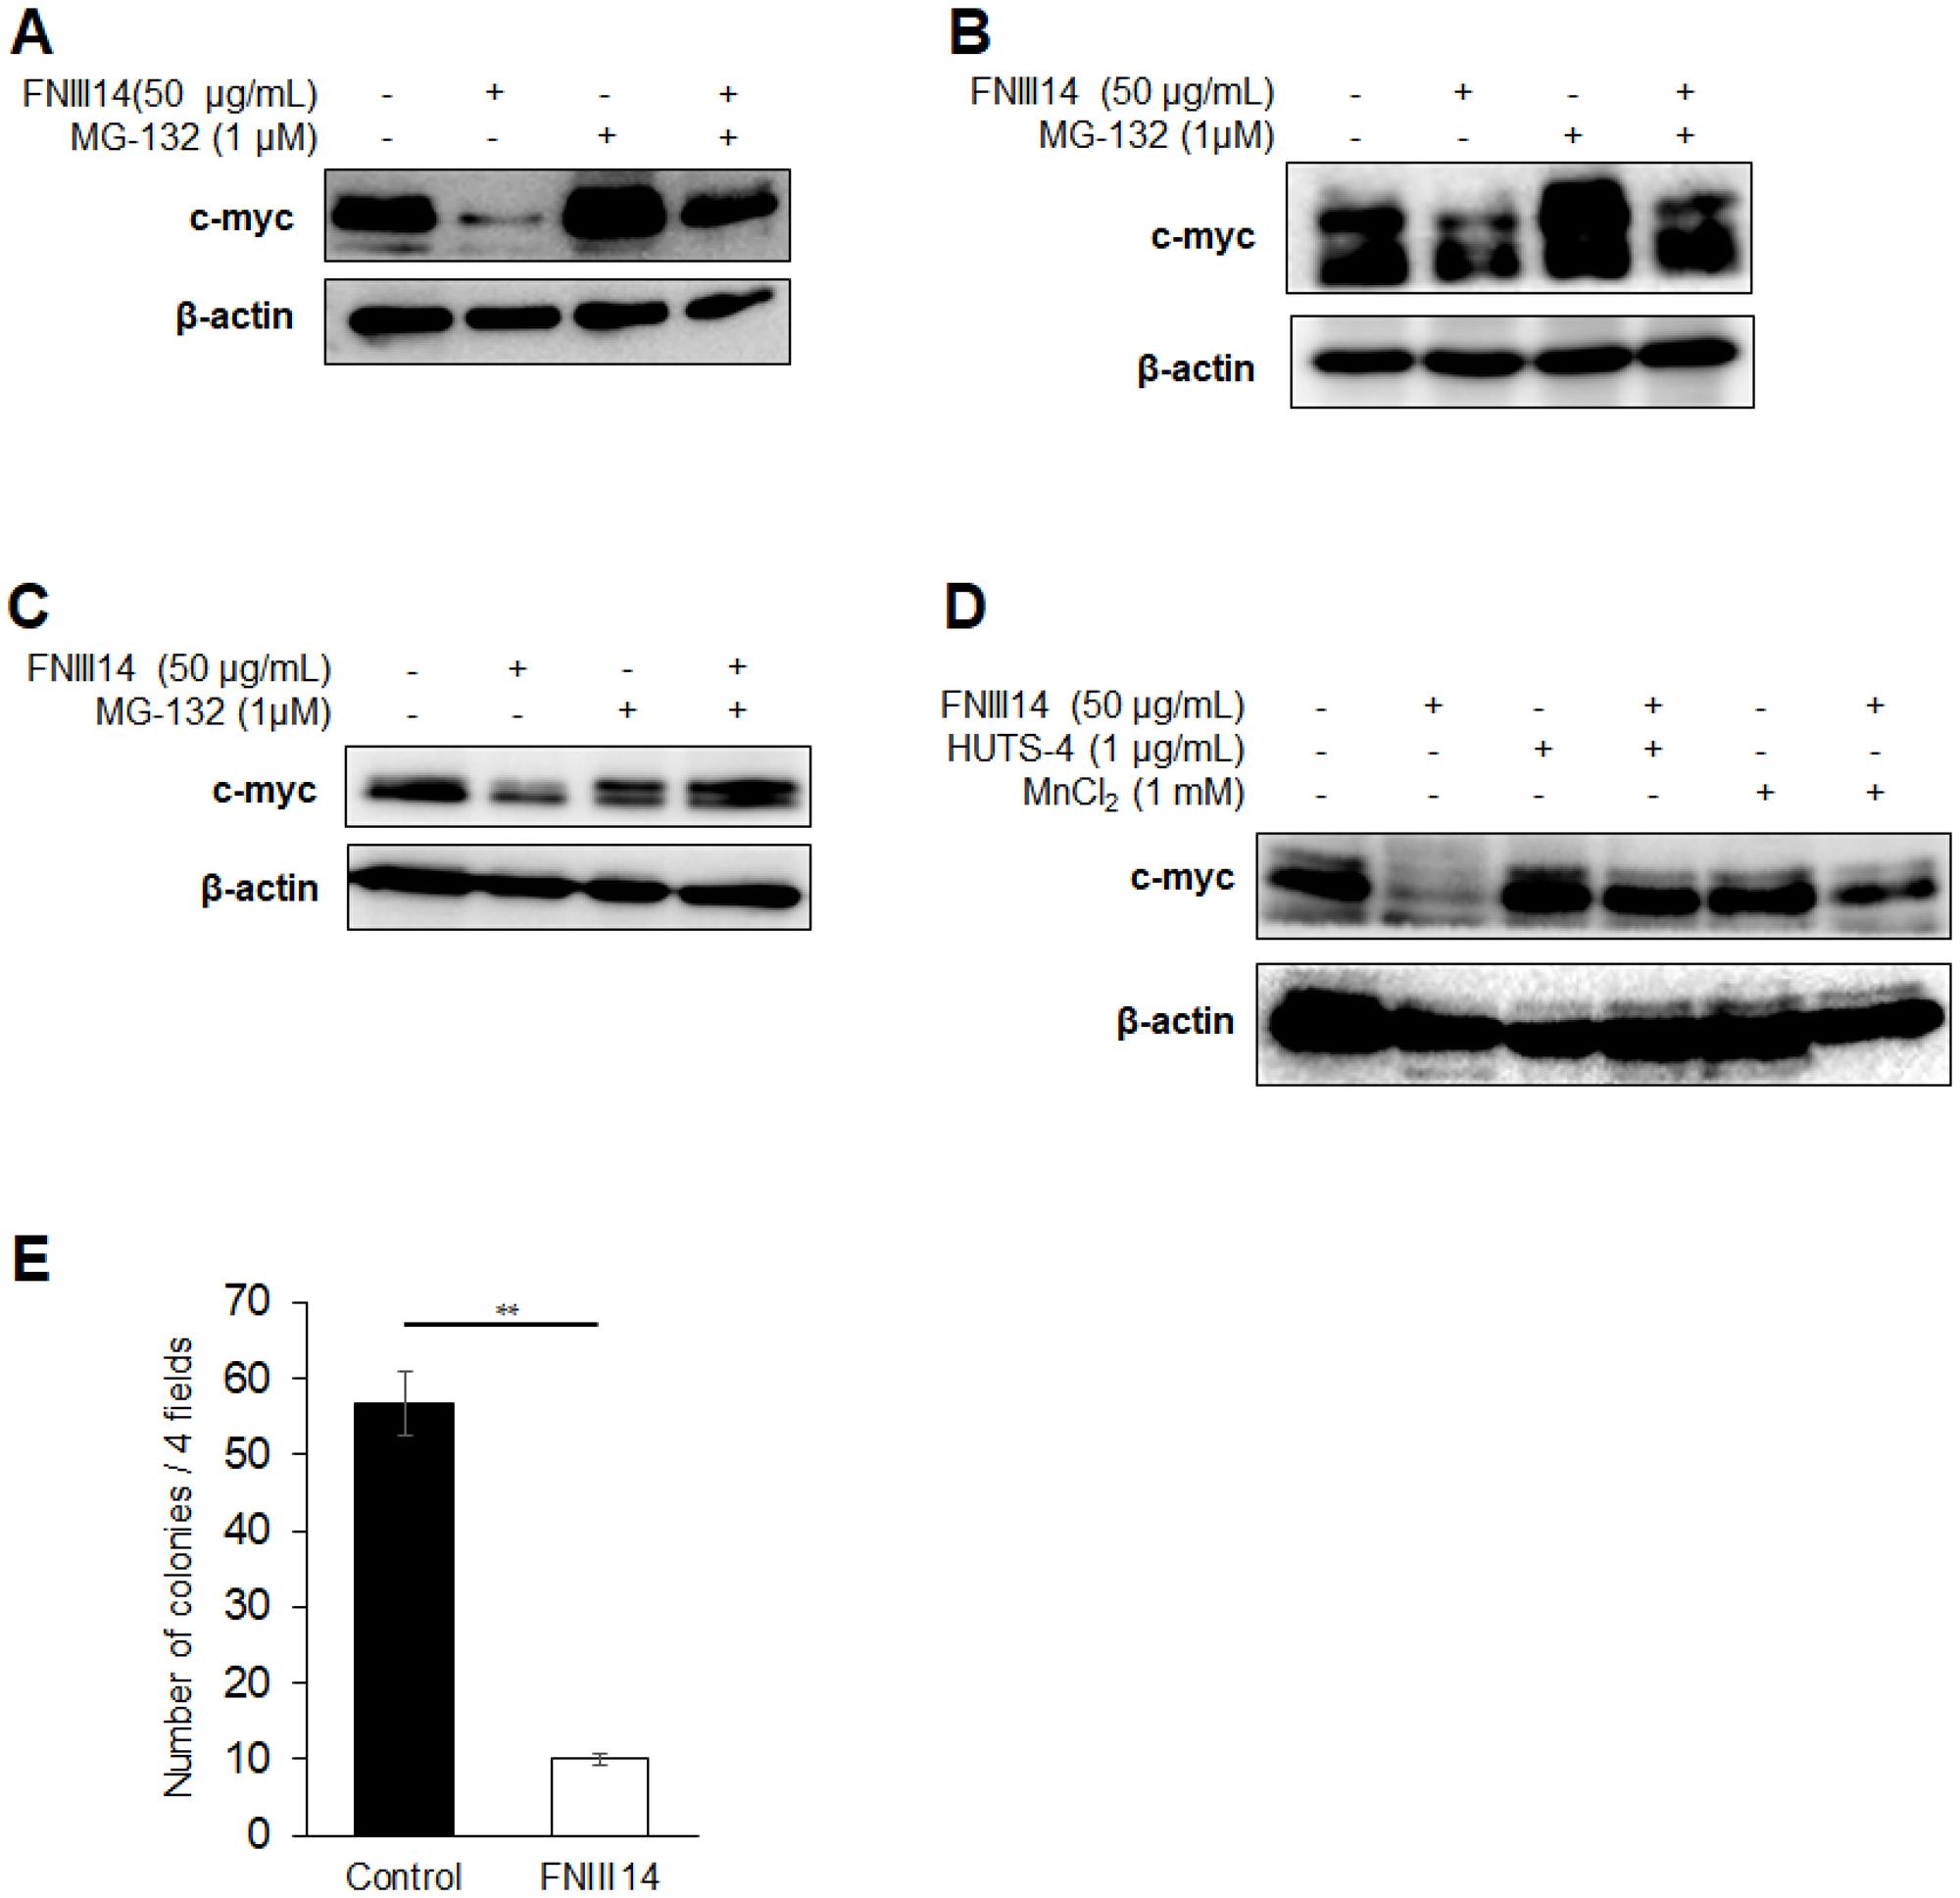 FNIII14 is able to induce degradation of c-myc as well as N-Myc.